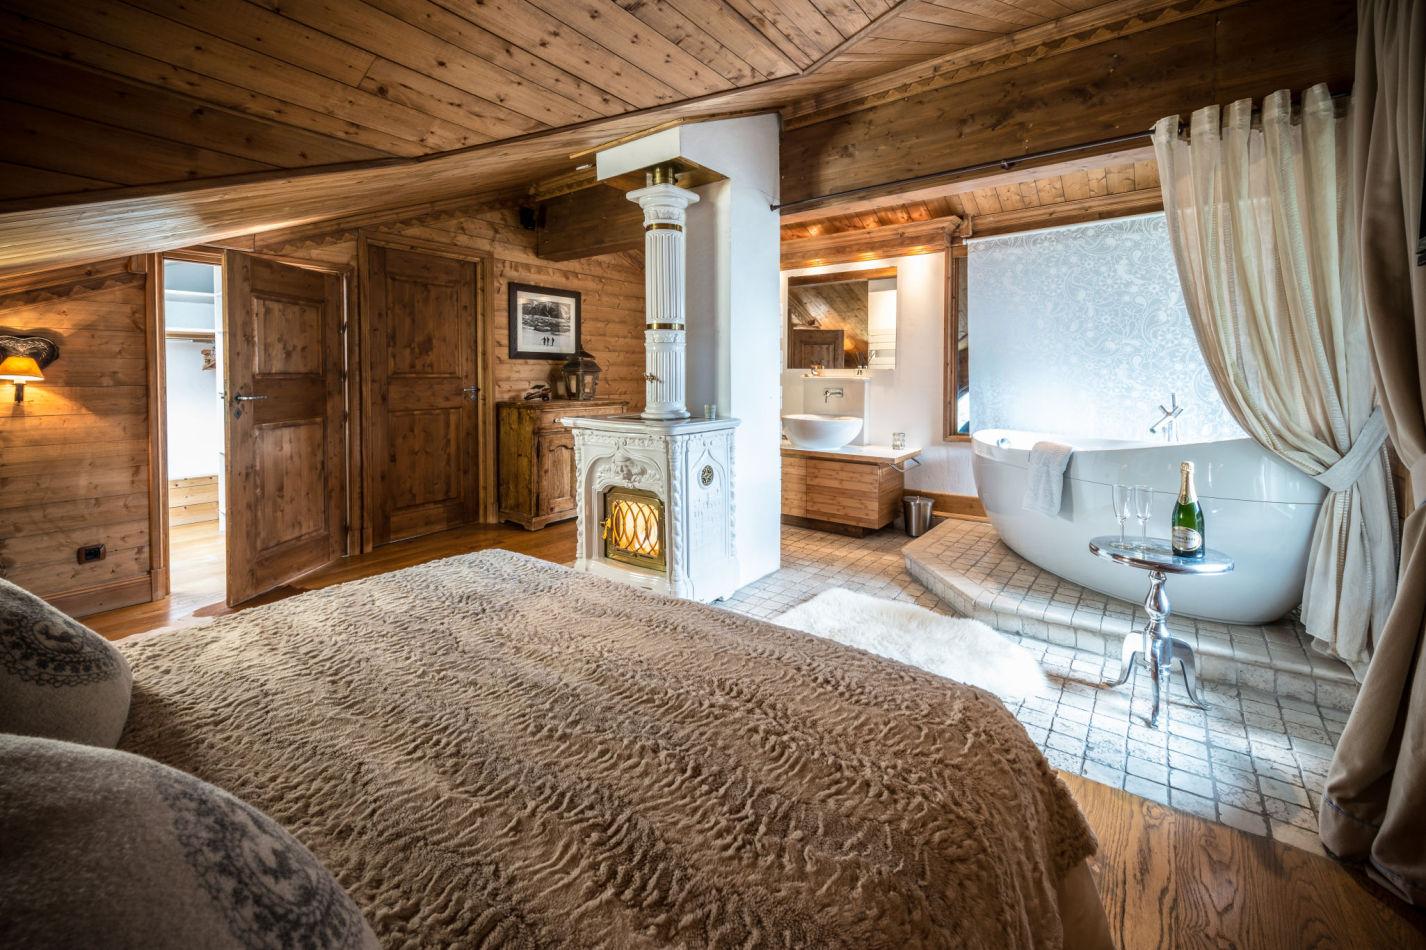 chalet-hermine-master-bedroom